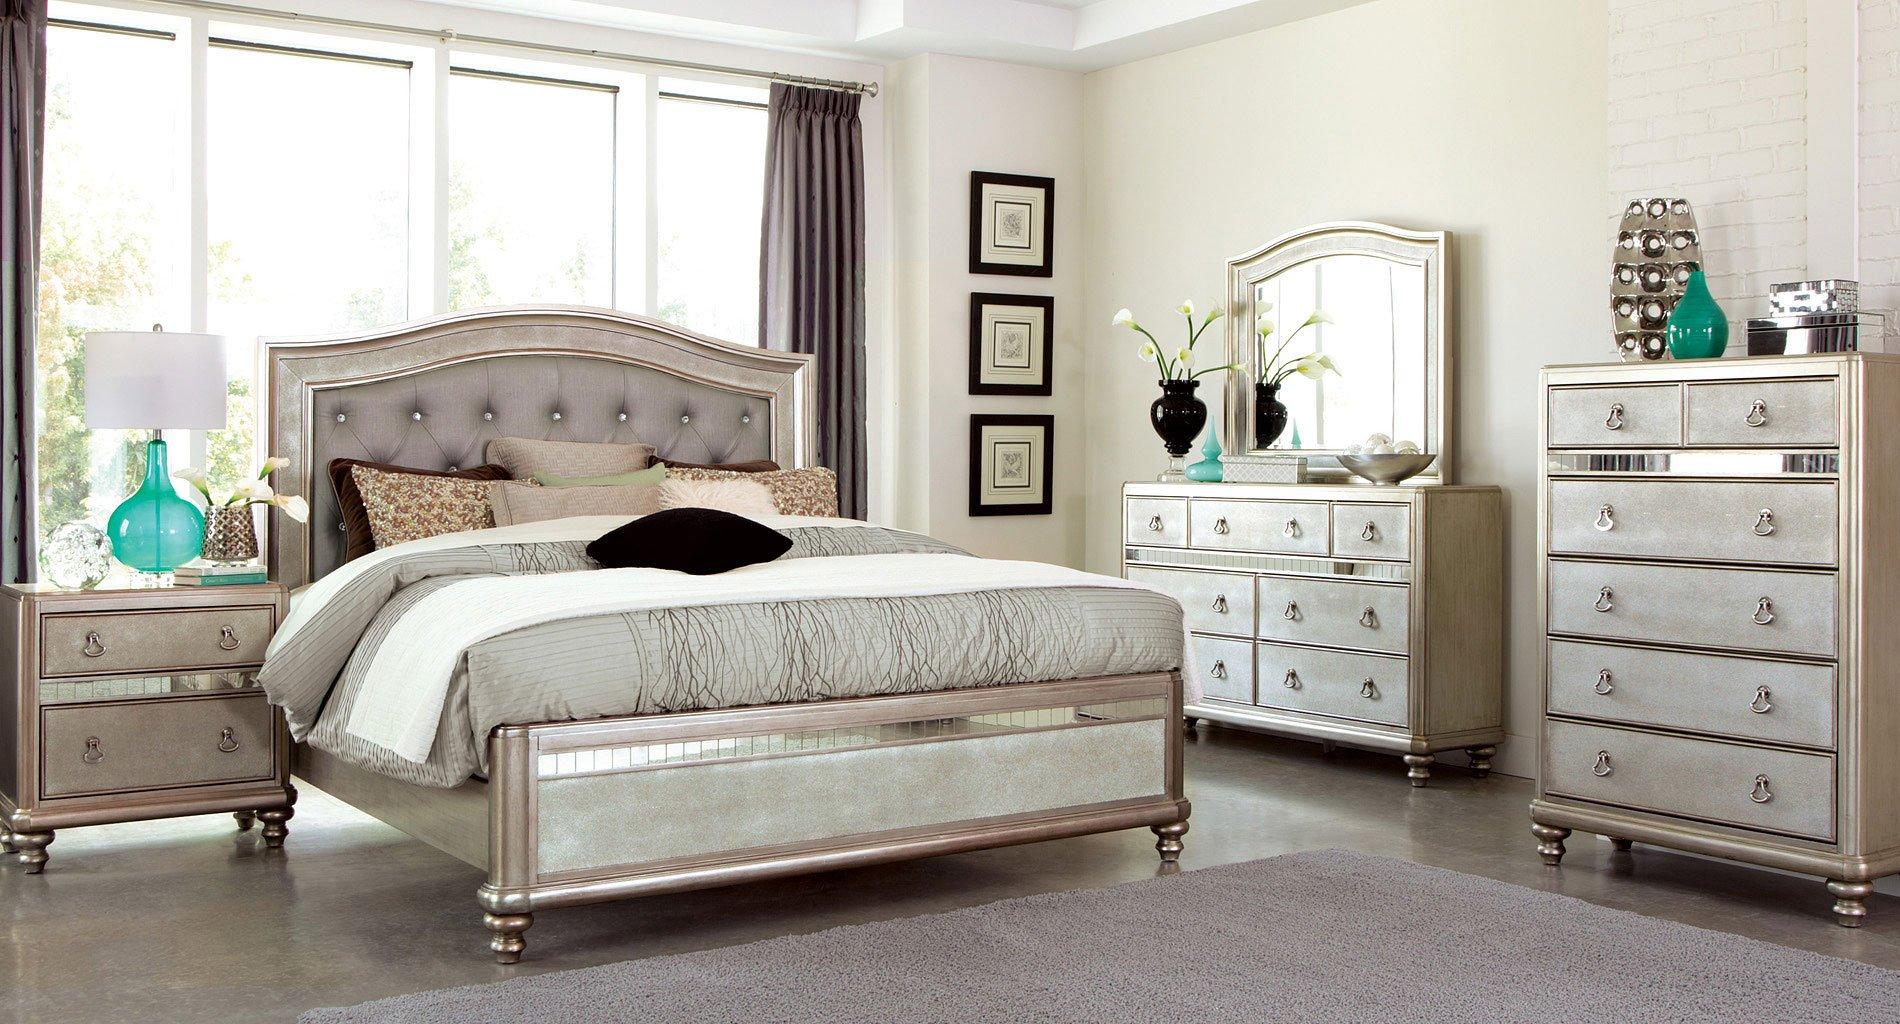 Bling game panel bedroom set coaster furniture 3 reviews furniture cart for Coaster bedroom furniture reviews